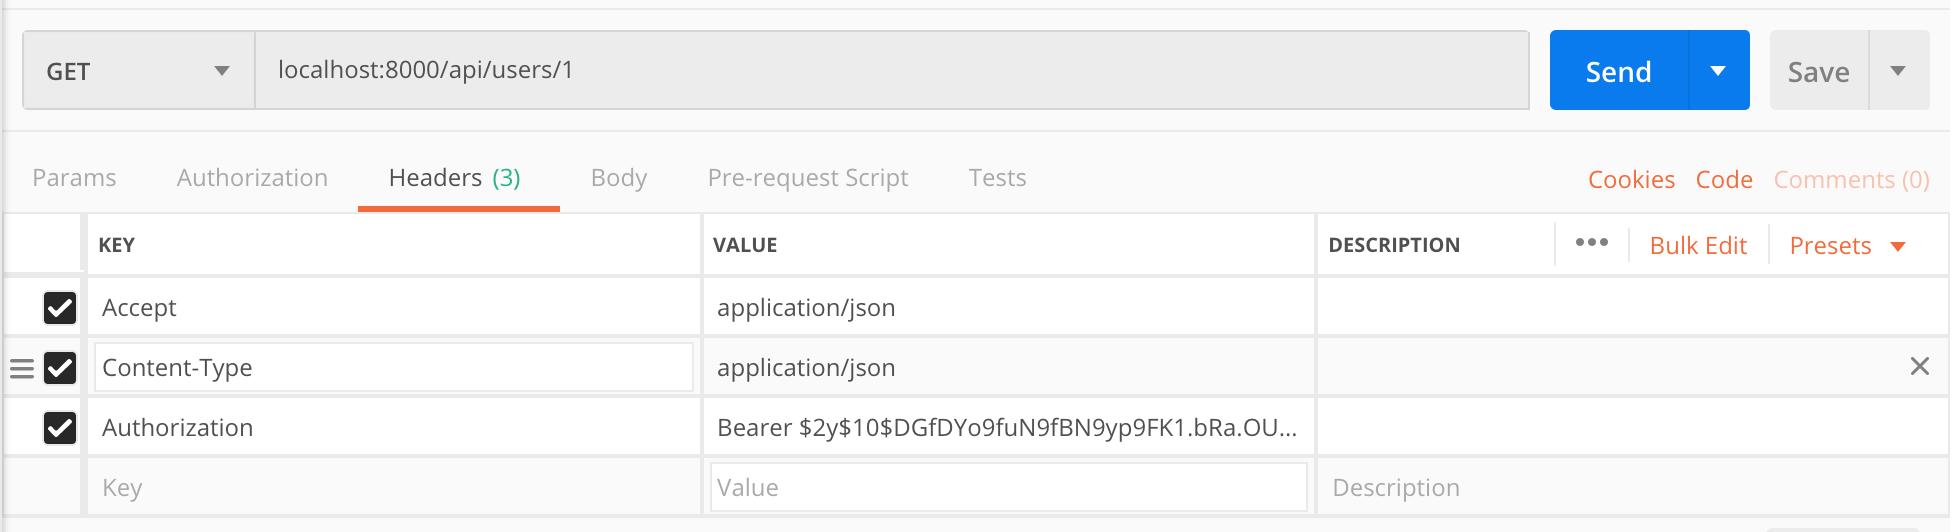 Laravel 5.7 Get Profile by ID